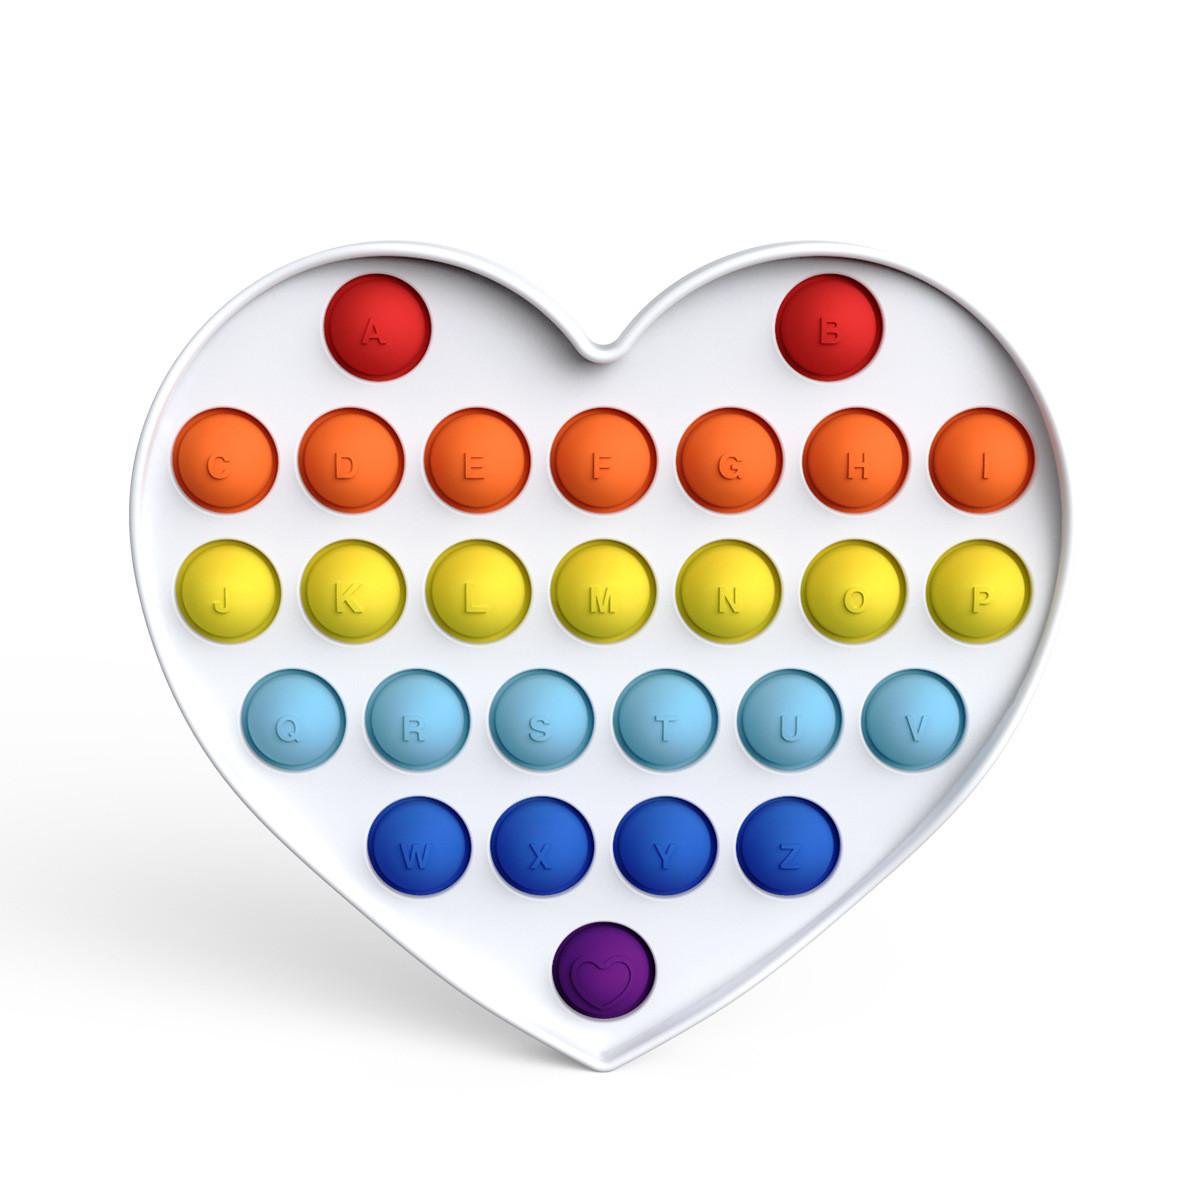 Игрушка антистресс Pop it на пластиковой основе сердце - фото 1